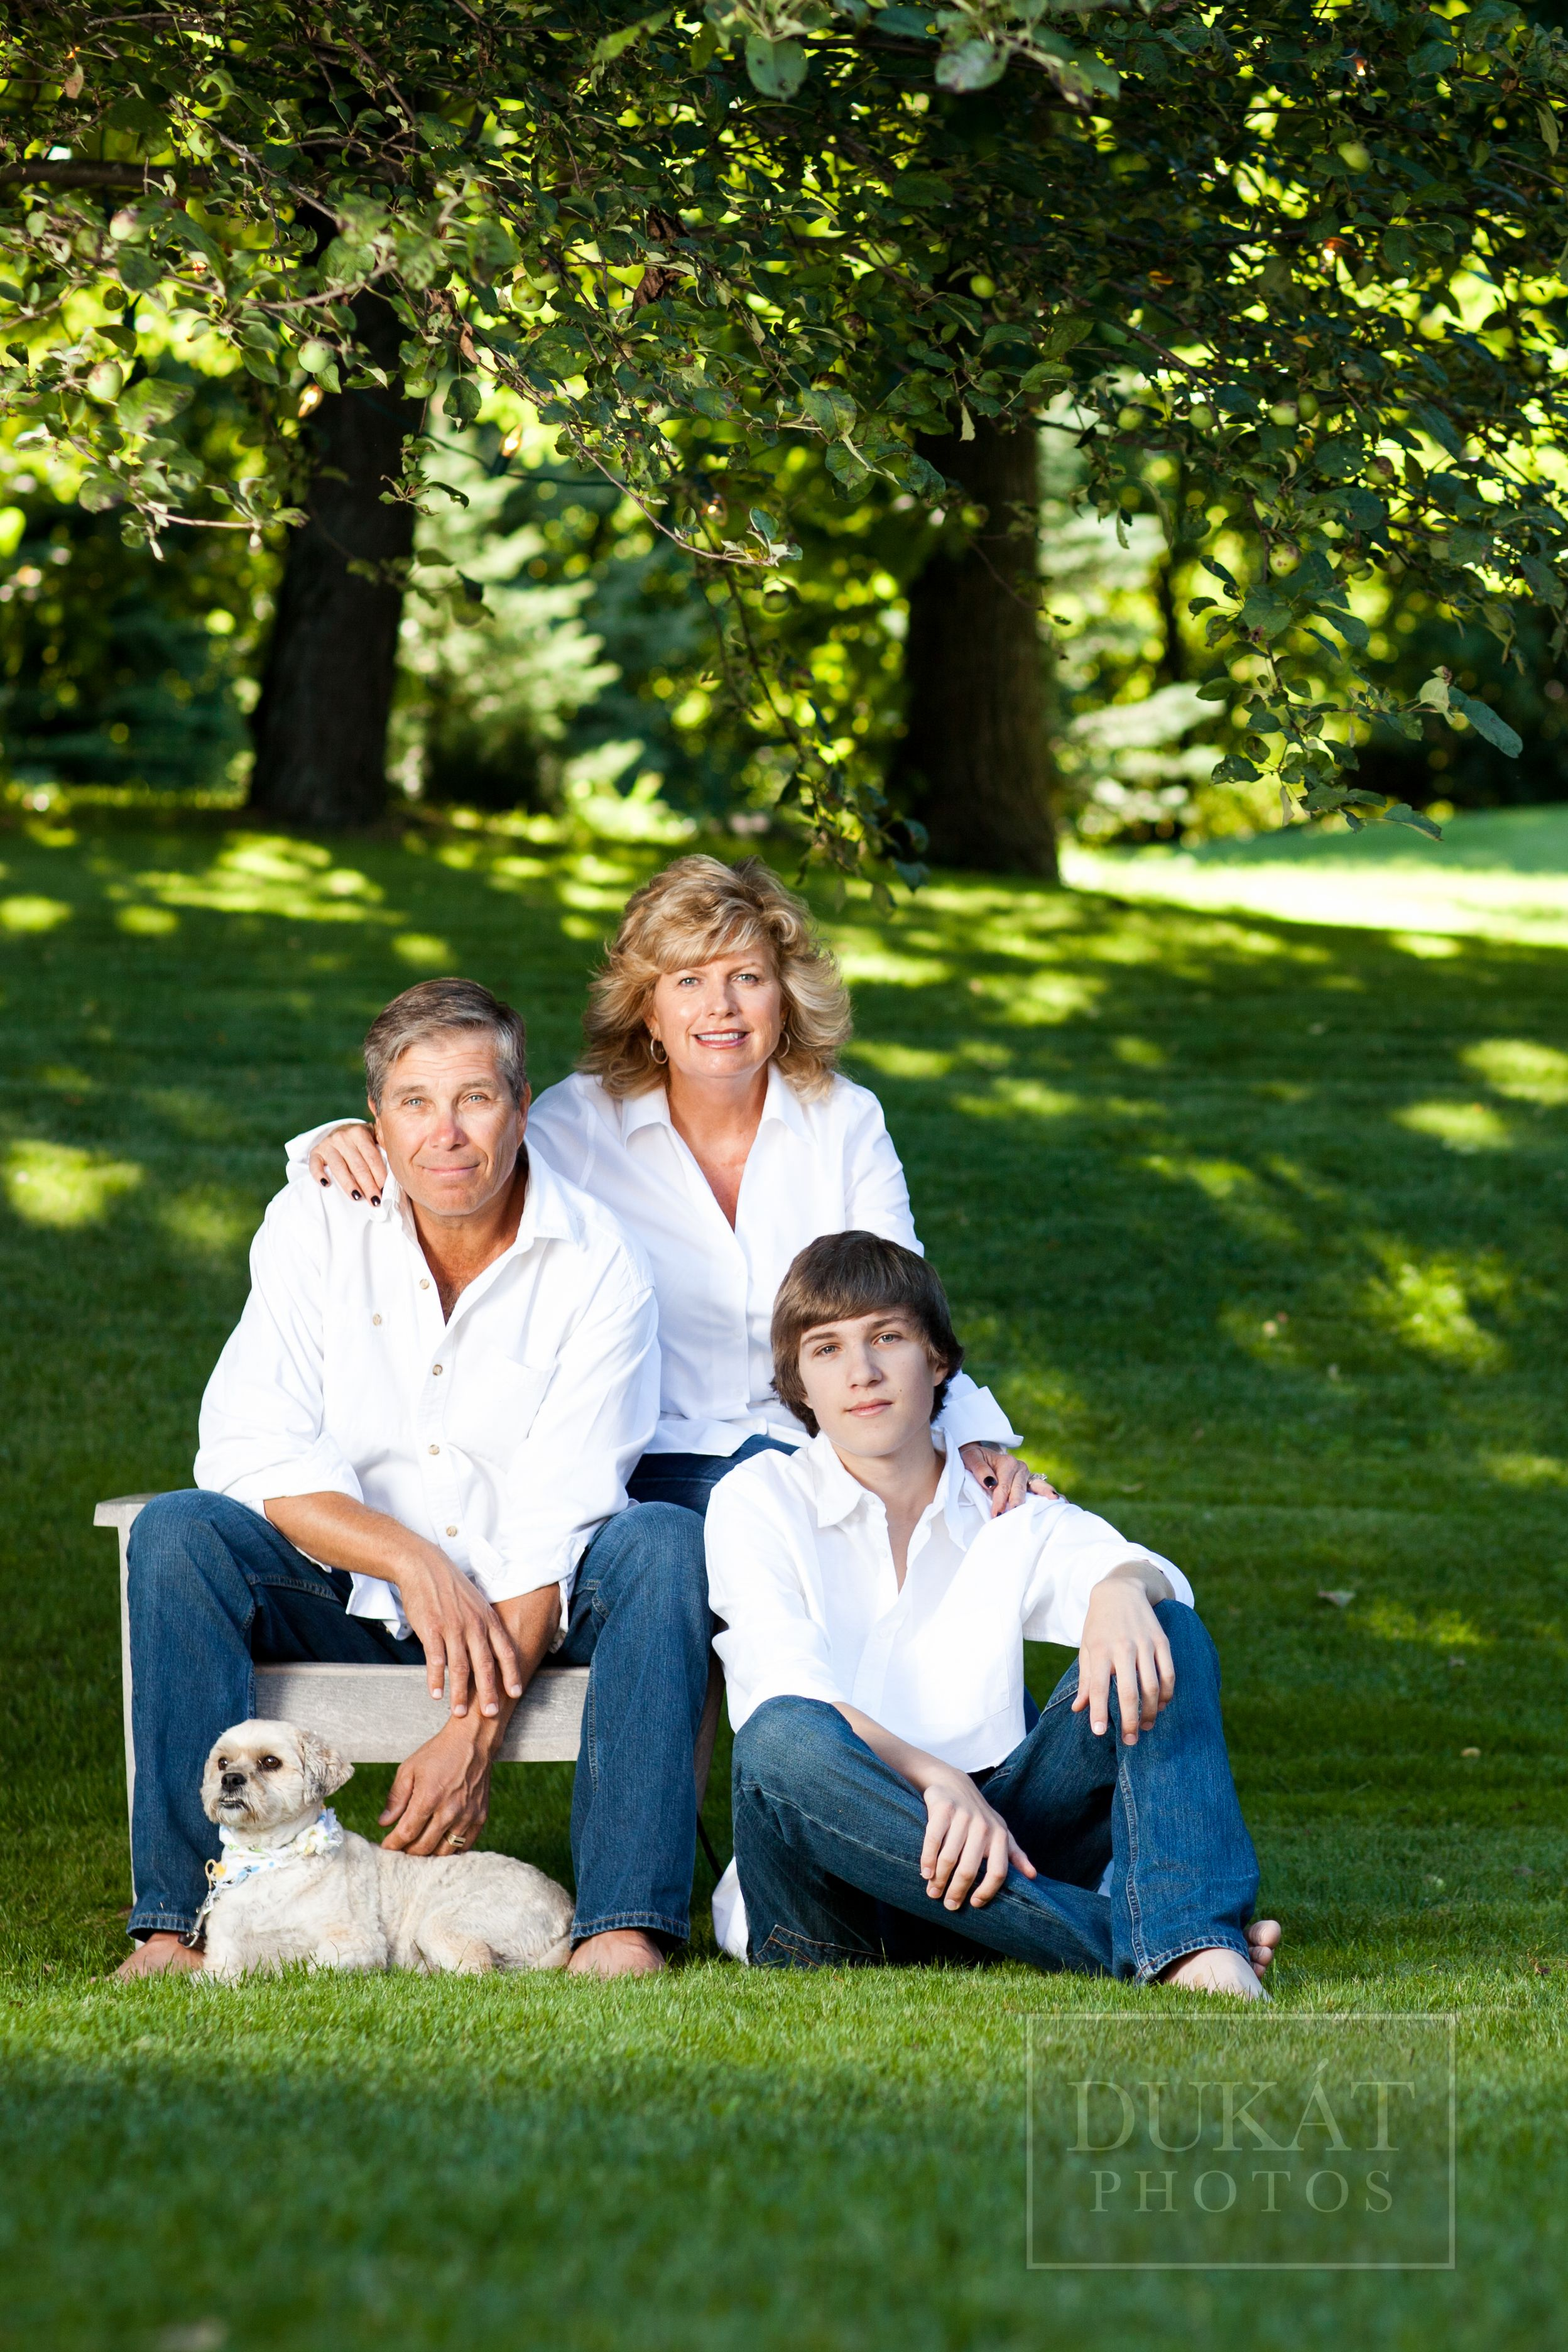 Outdoor Summer Family Photo Shoot